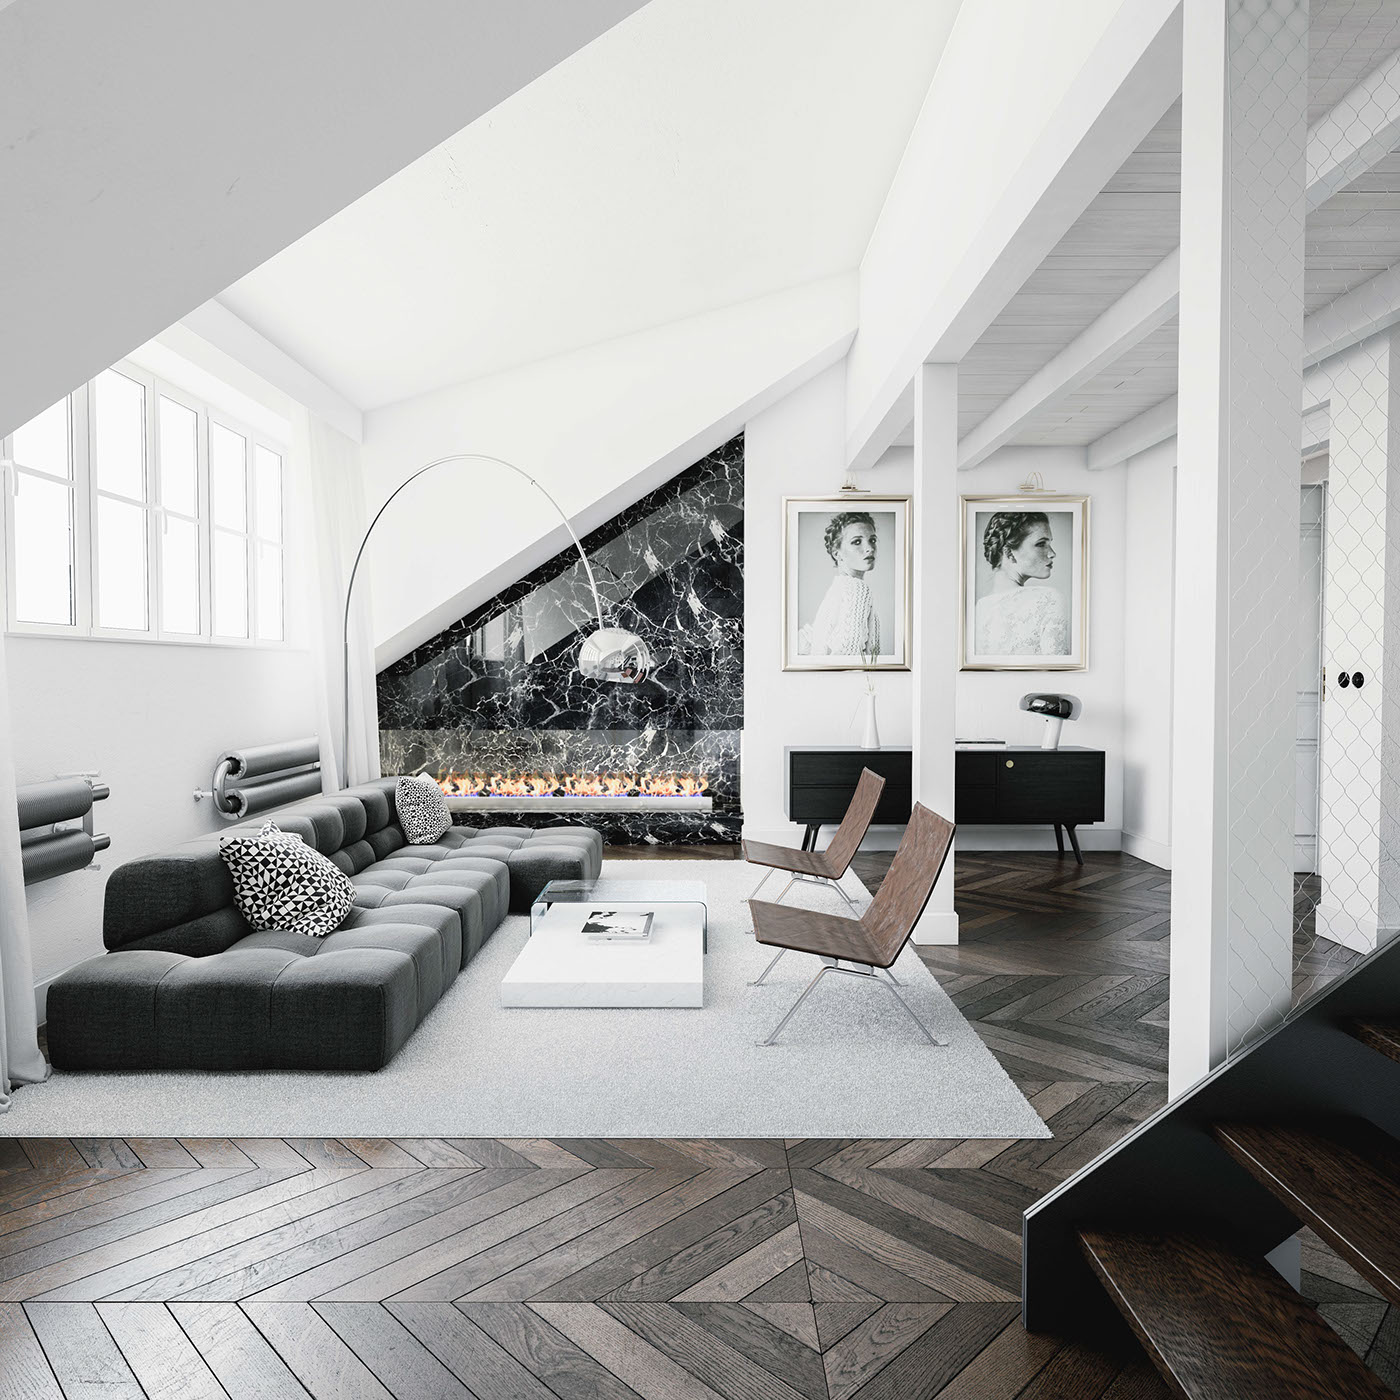 Prague Apartment On Behance